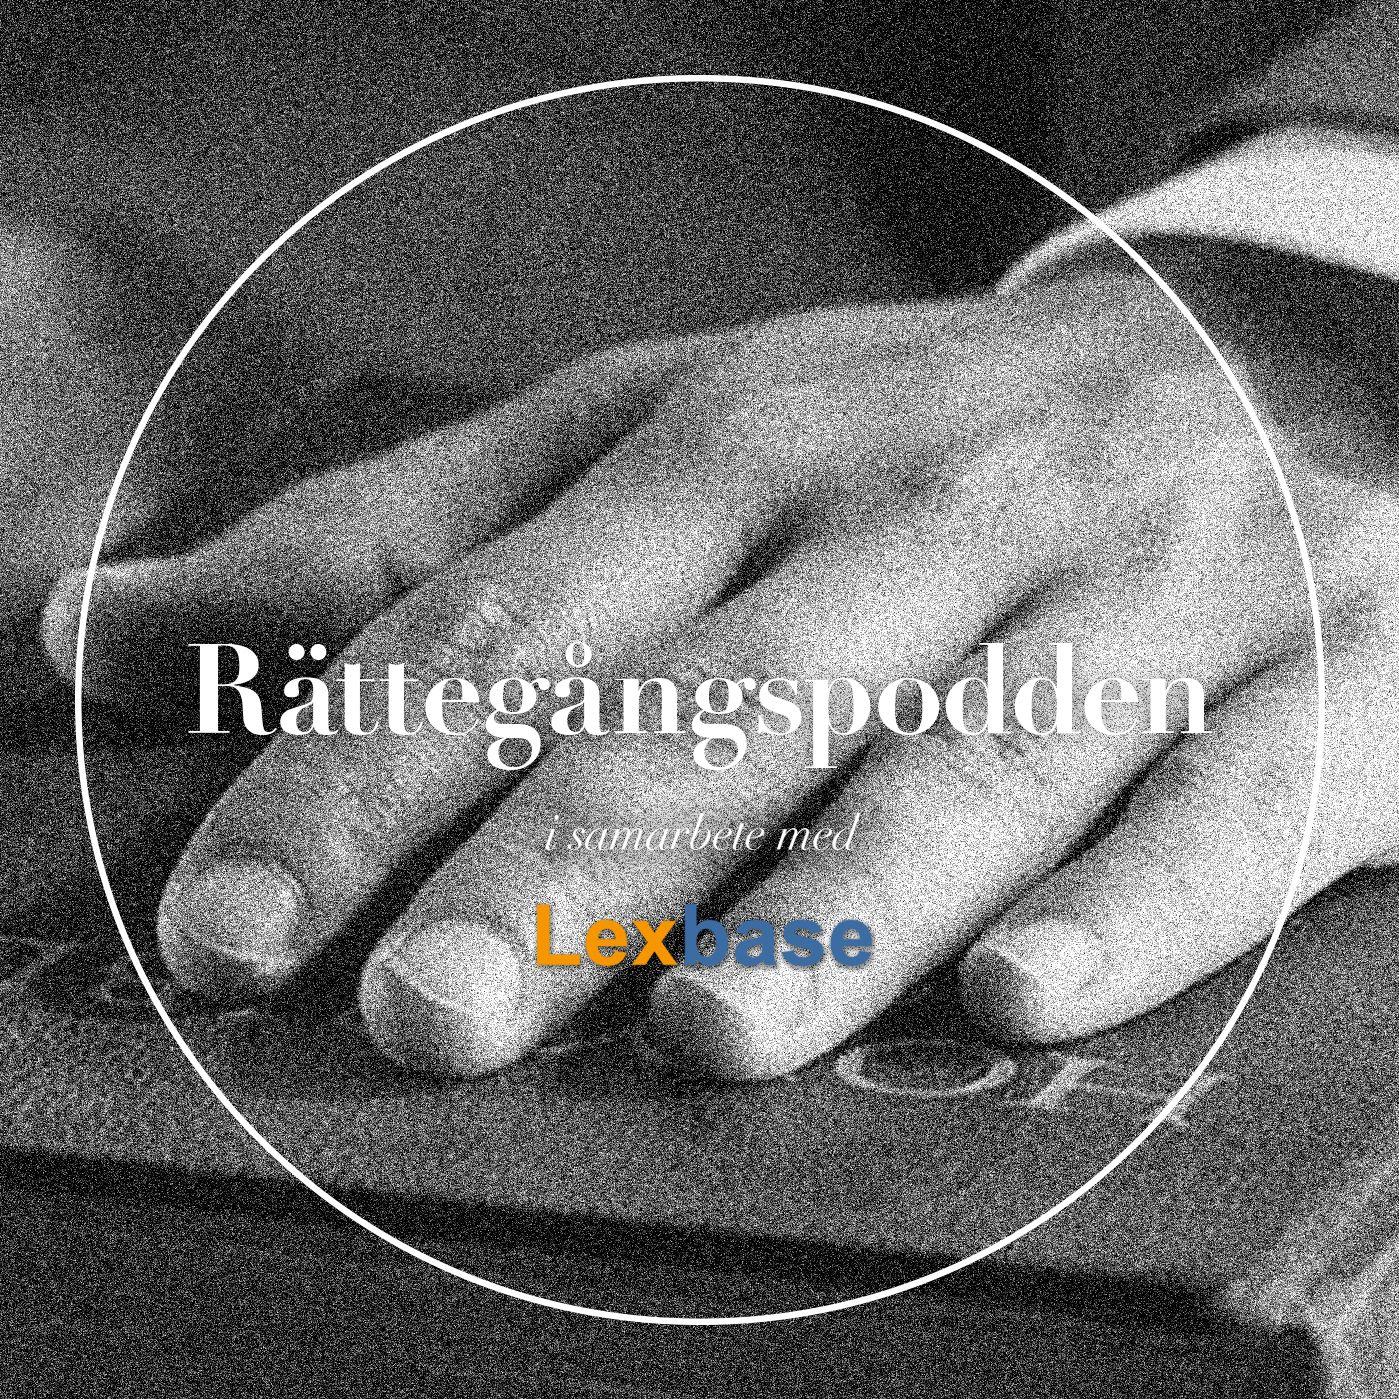 S04E01 Fallet Tova Moberg - Del 1/2